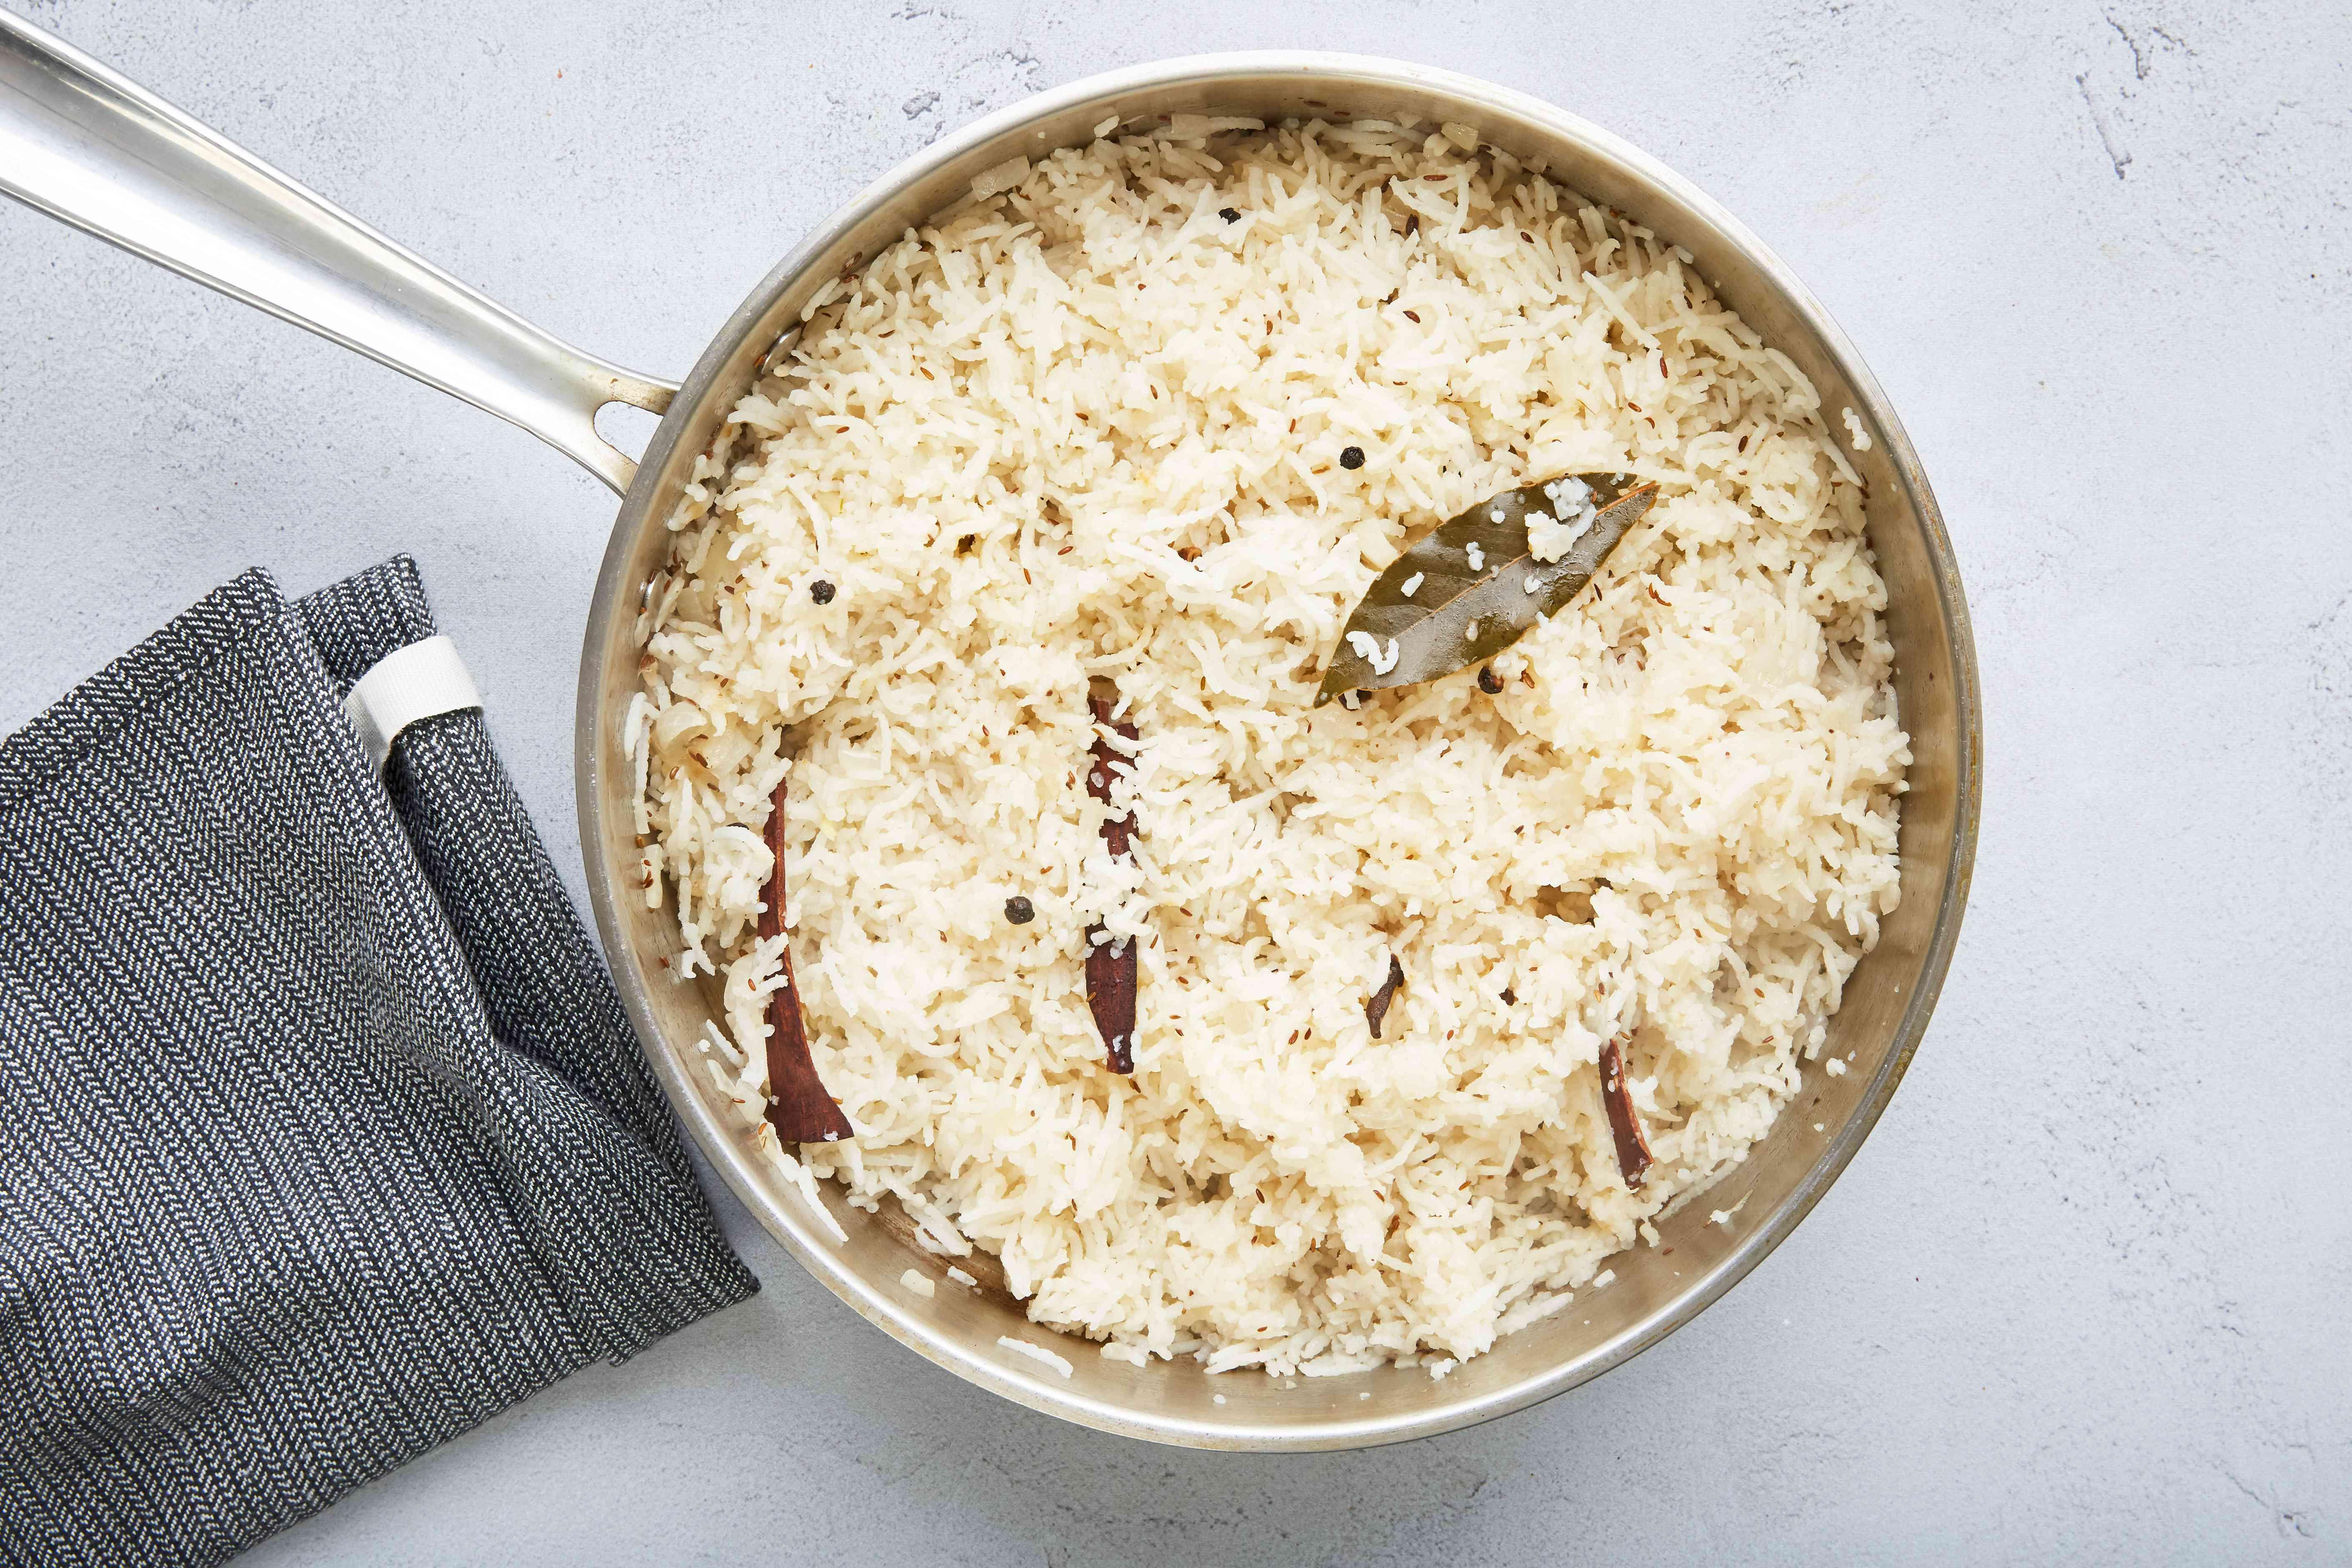 Fluffy Indian basmati rice in a pot